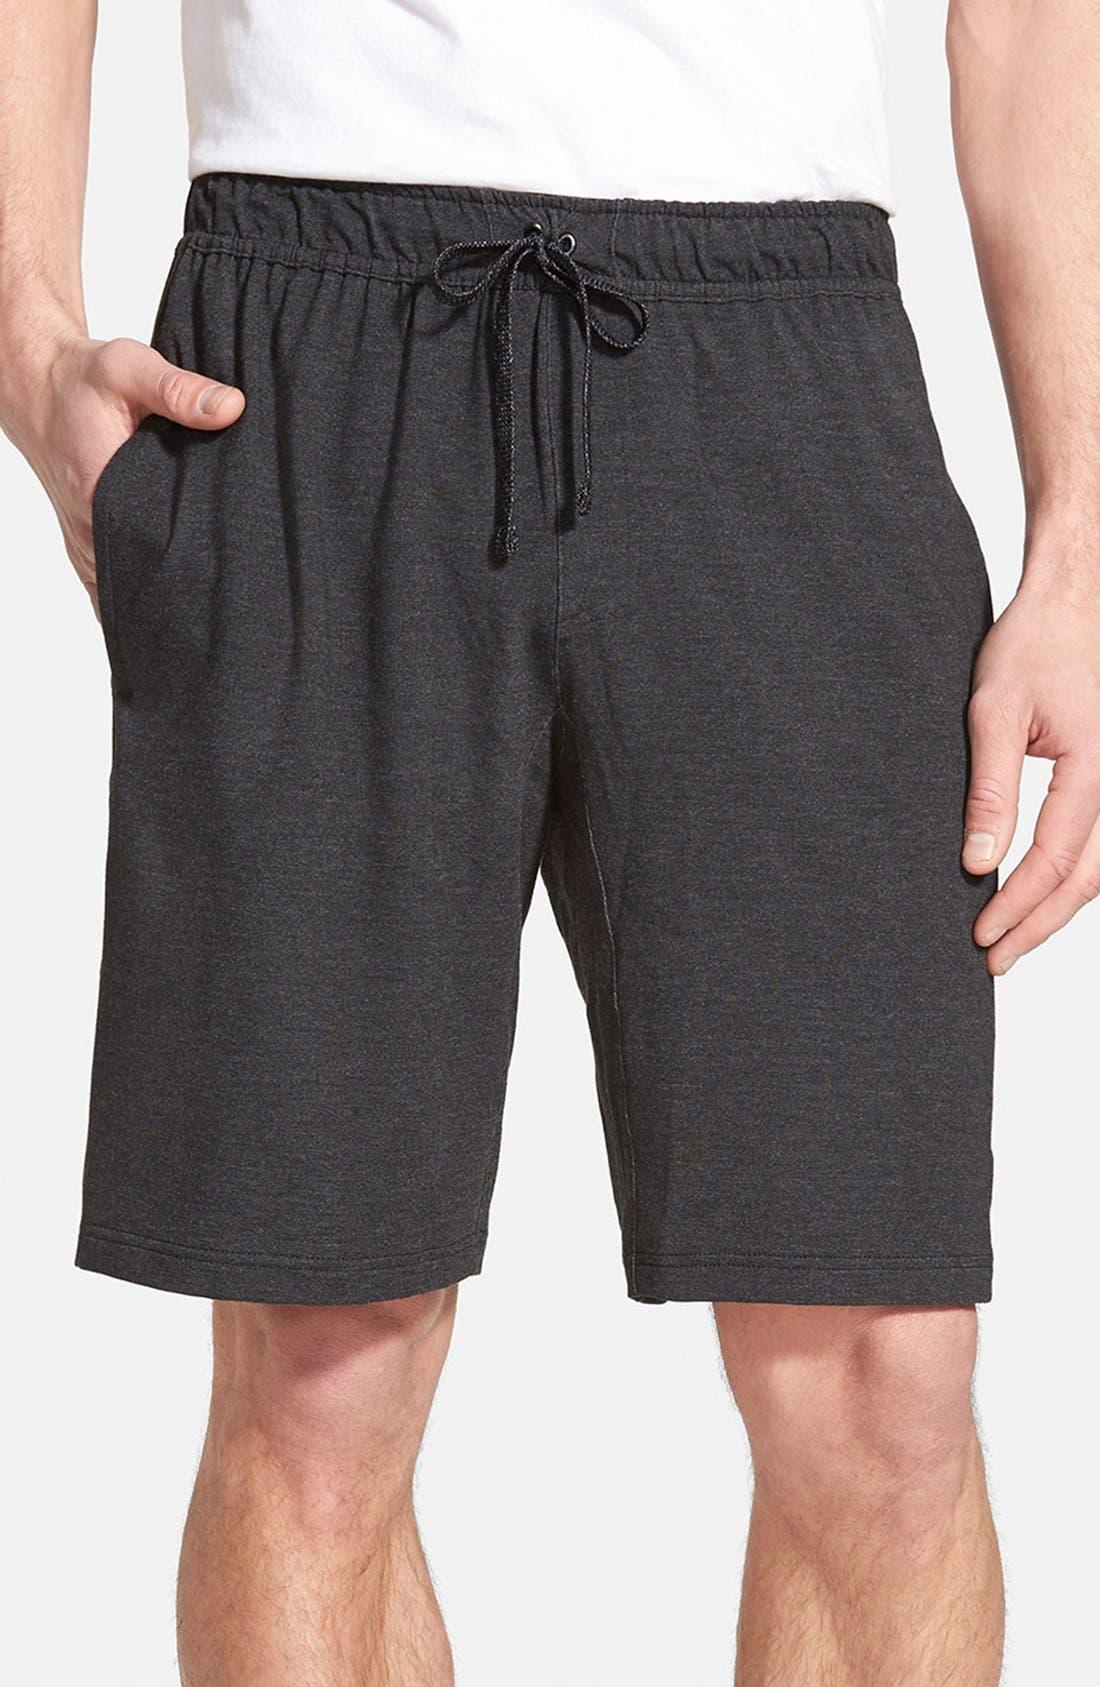 NIKE Dri-FIT Touch Fleece Shorts, Main, color, 010